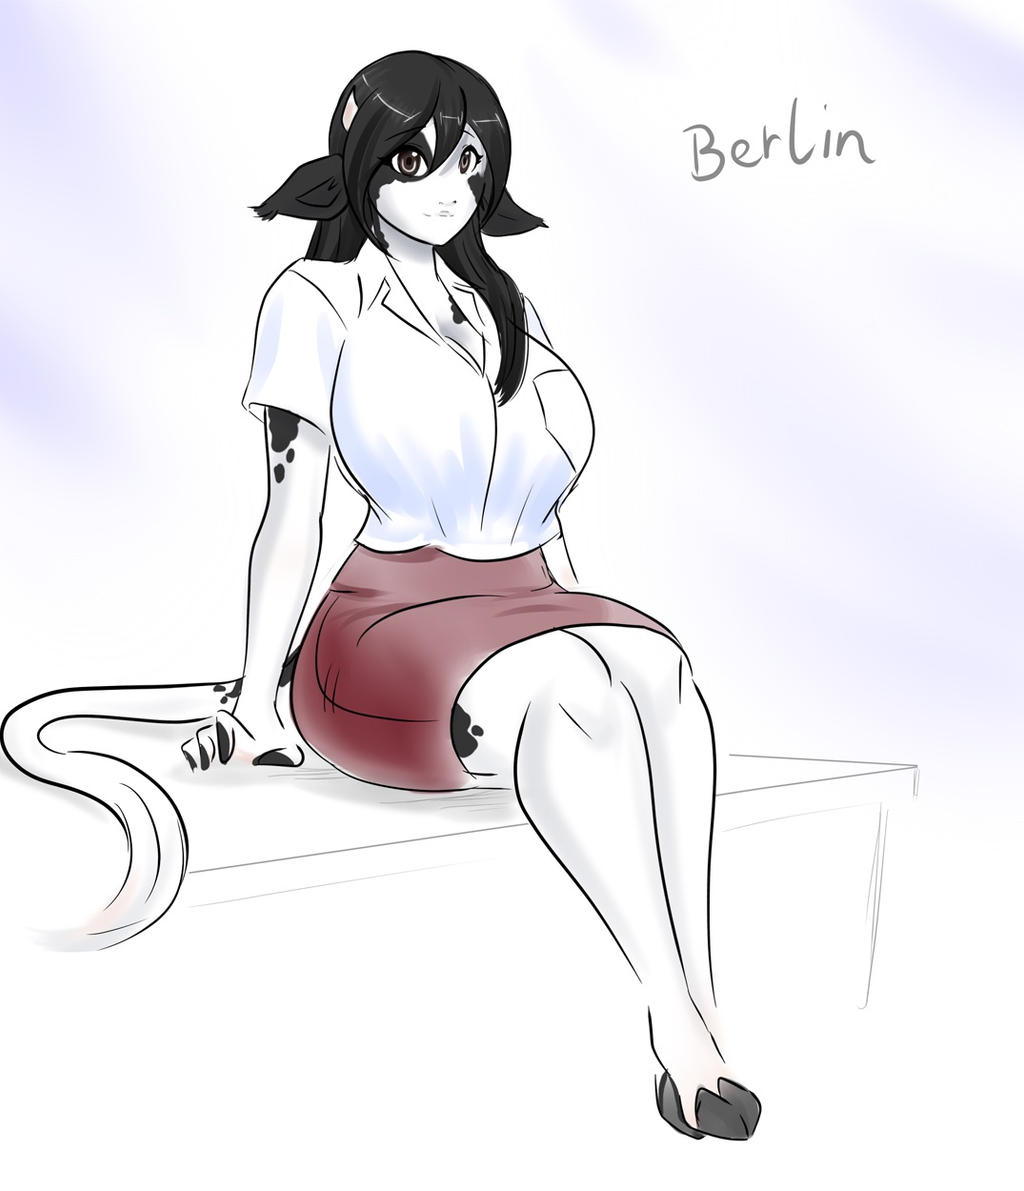 Berlin by gary2112